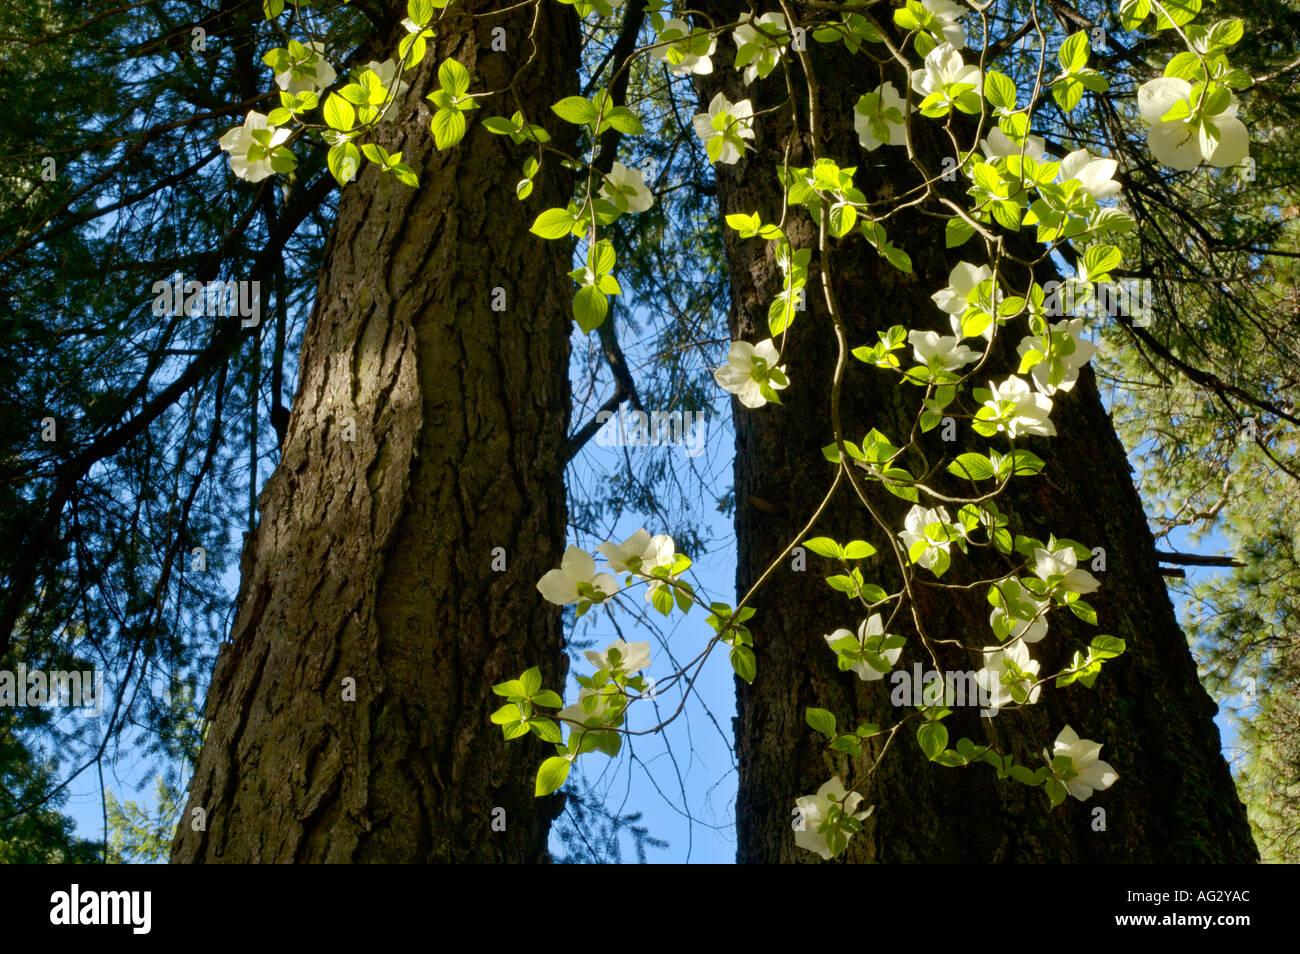 Dogwood tree flowers blossom in spring yosemite valley yosemite dogwood tree flowers blossom in spring yosemite valley yosemite national park california mightylinksfo